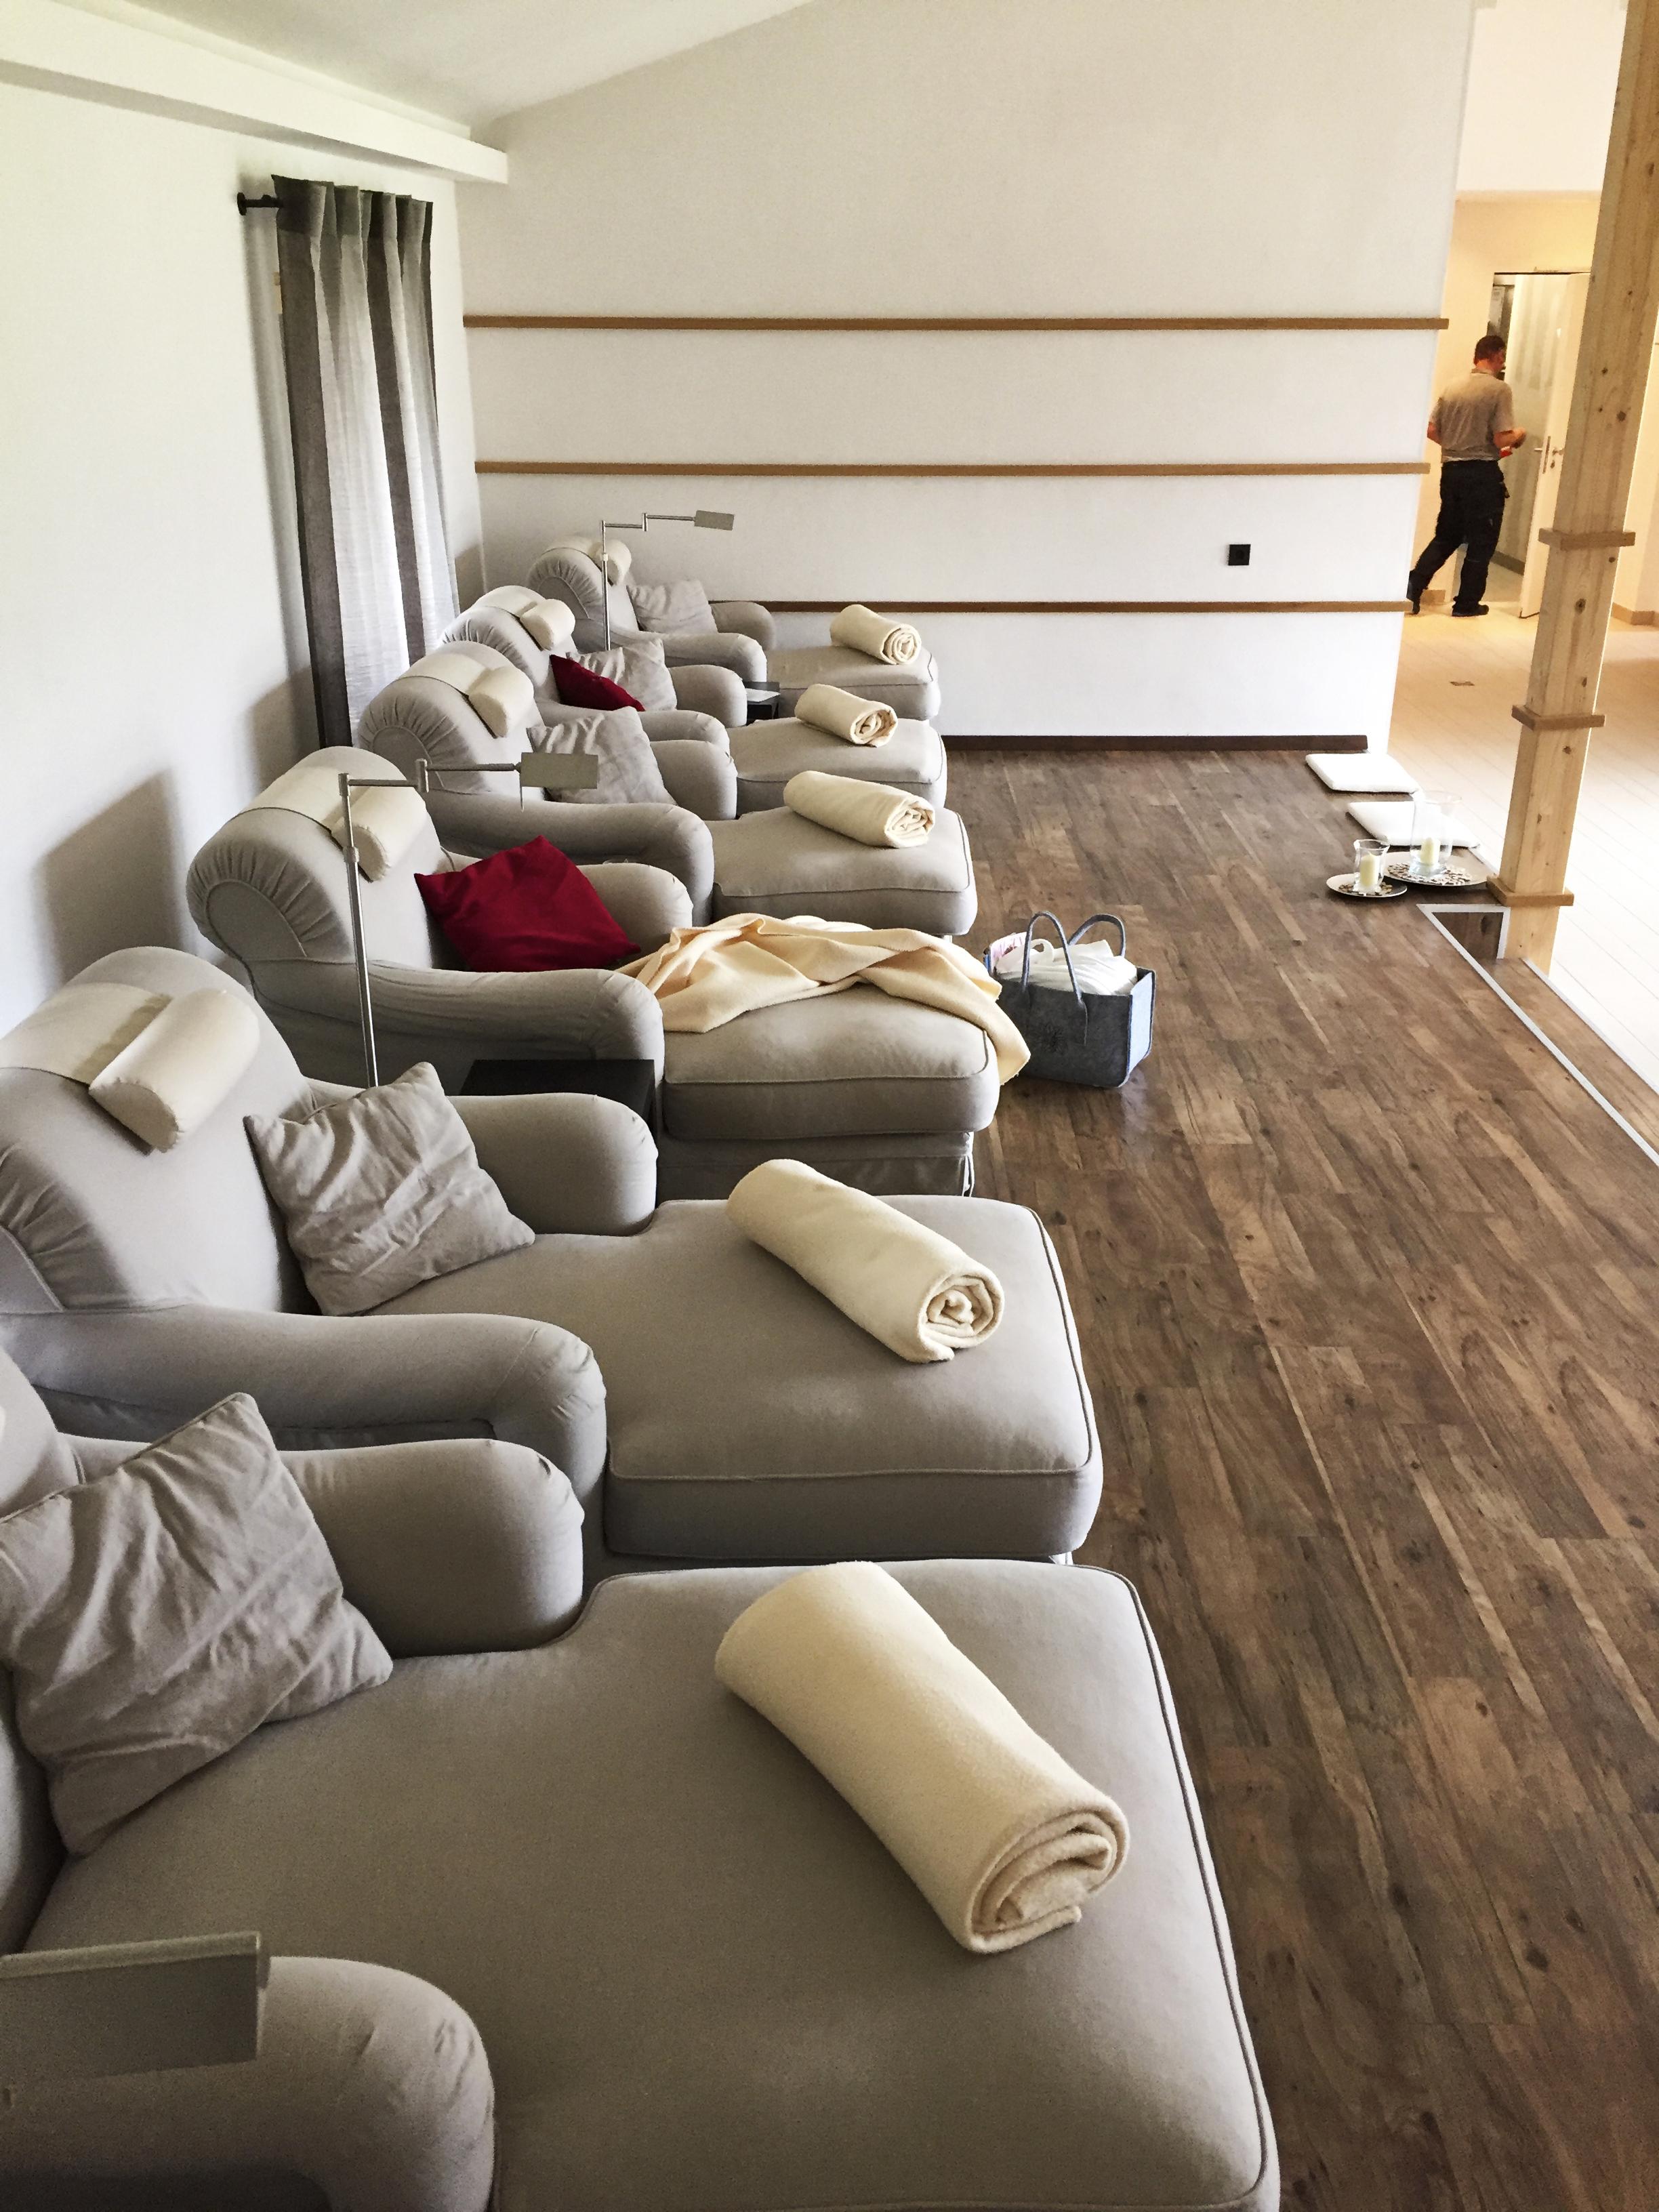 Detox Sauna Lady Spa Hotel Schuele